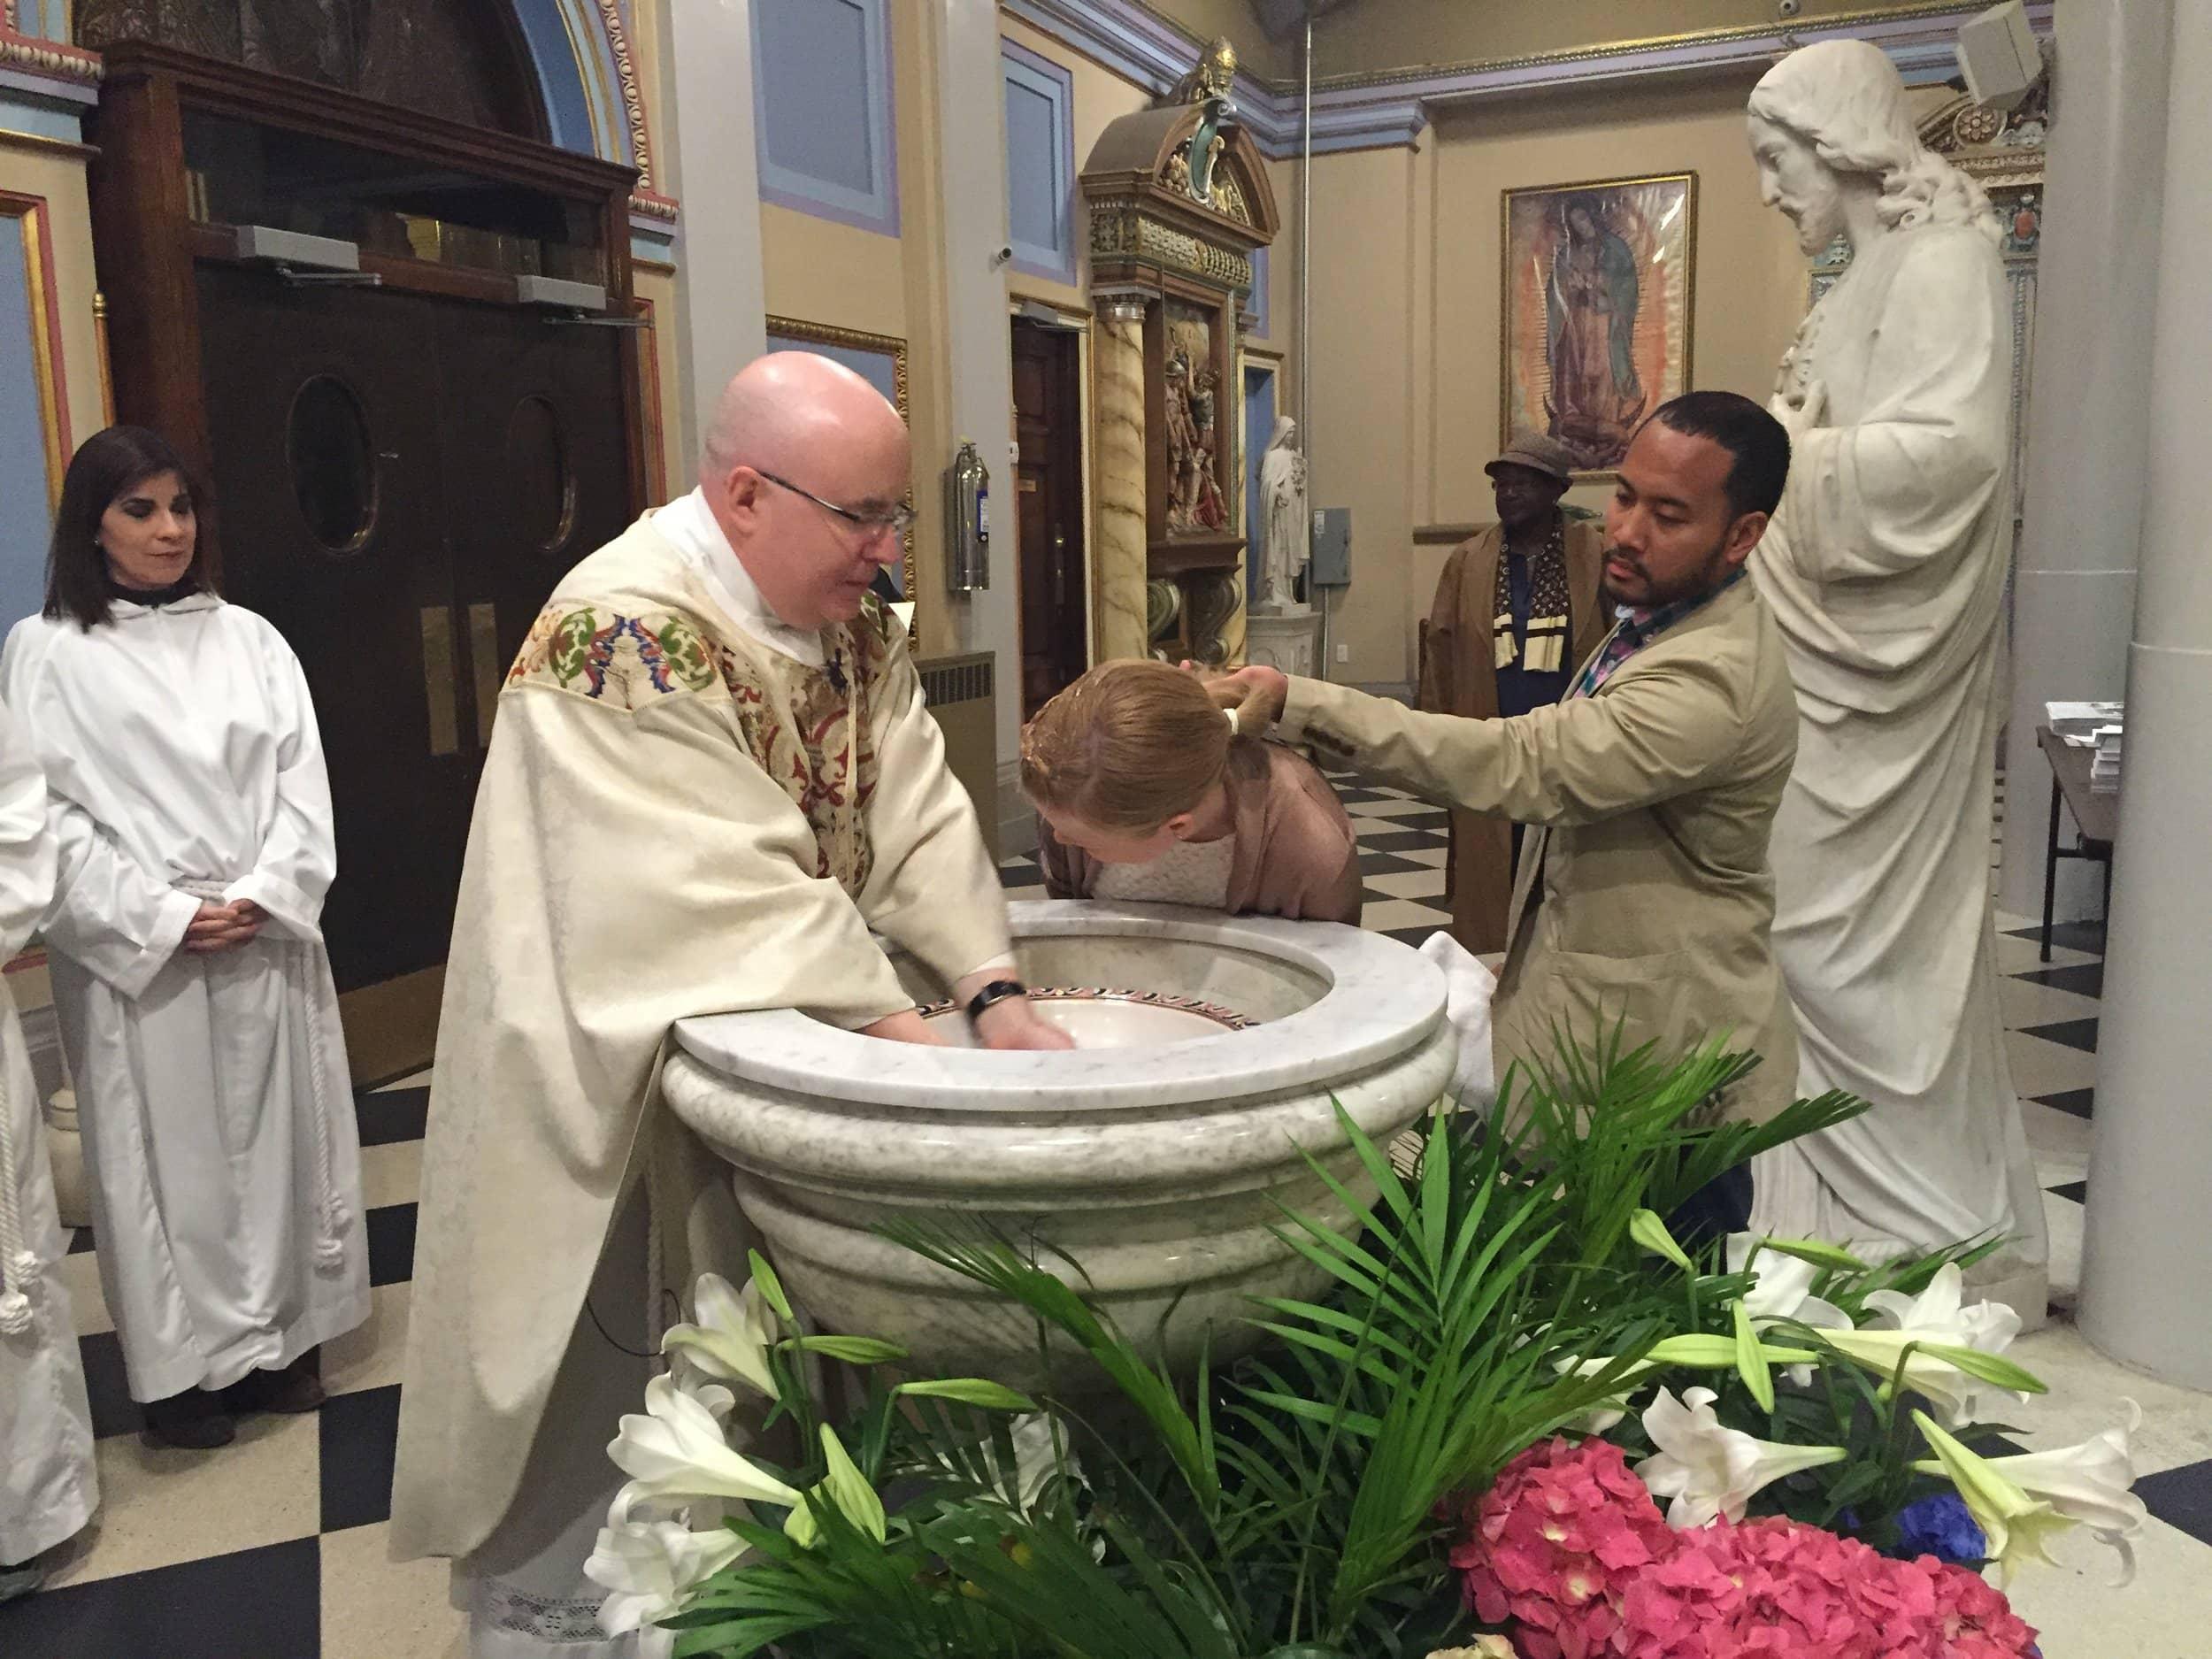 baptism_sacraments-st-francis-de-sales-church-new-york-city.jpg